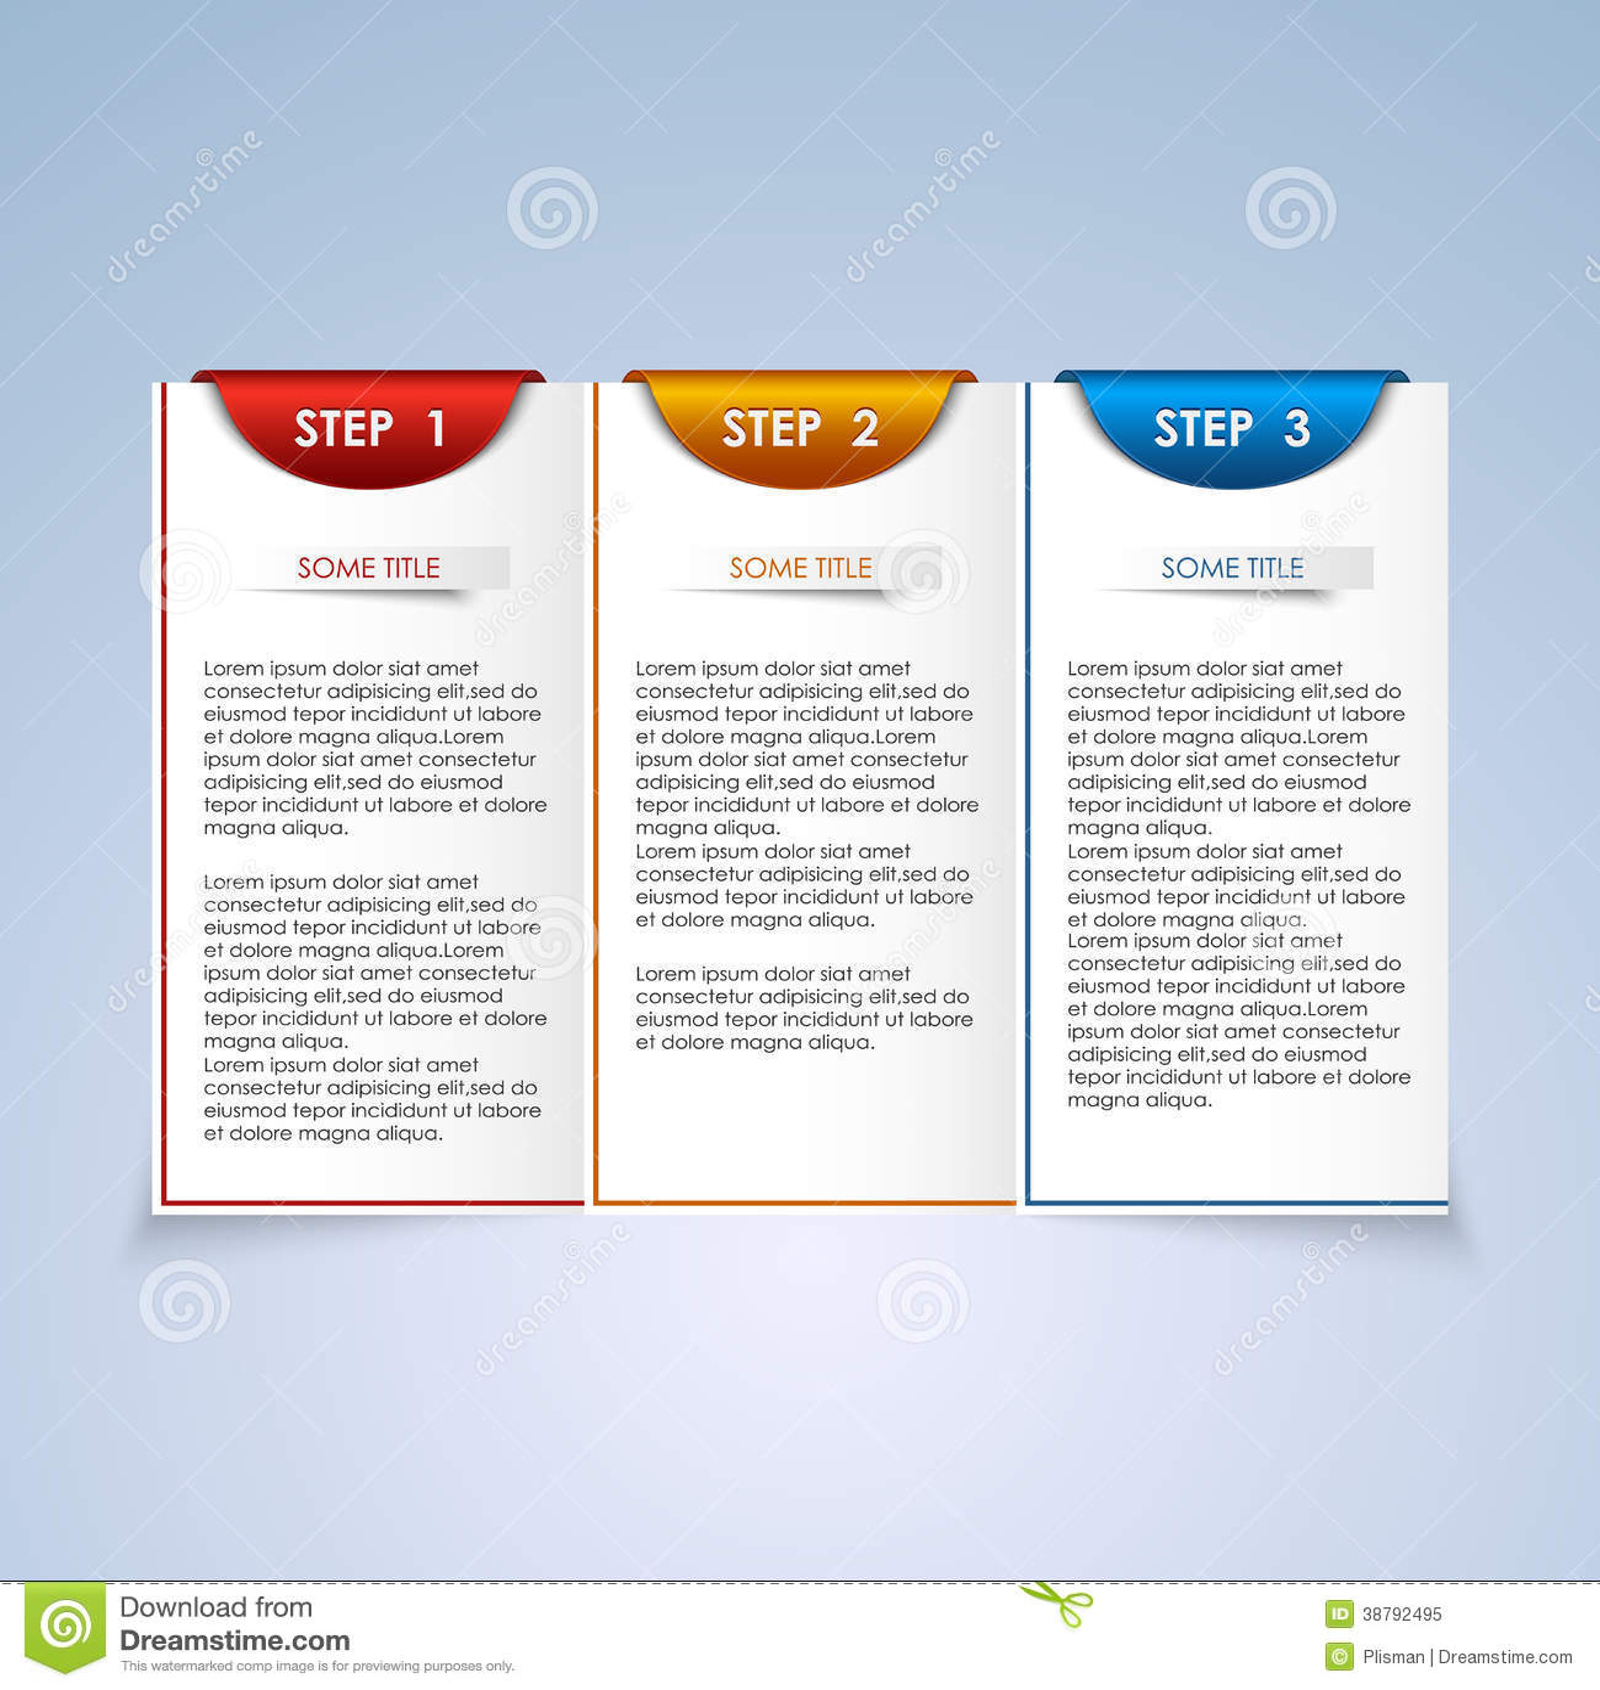 Brochure Step Progress Design Element Stock Vector - Image: 38792495